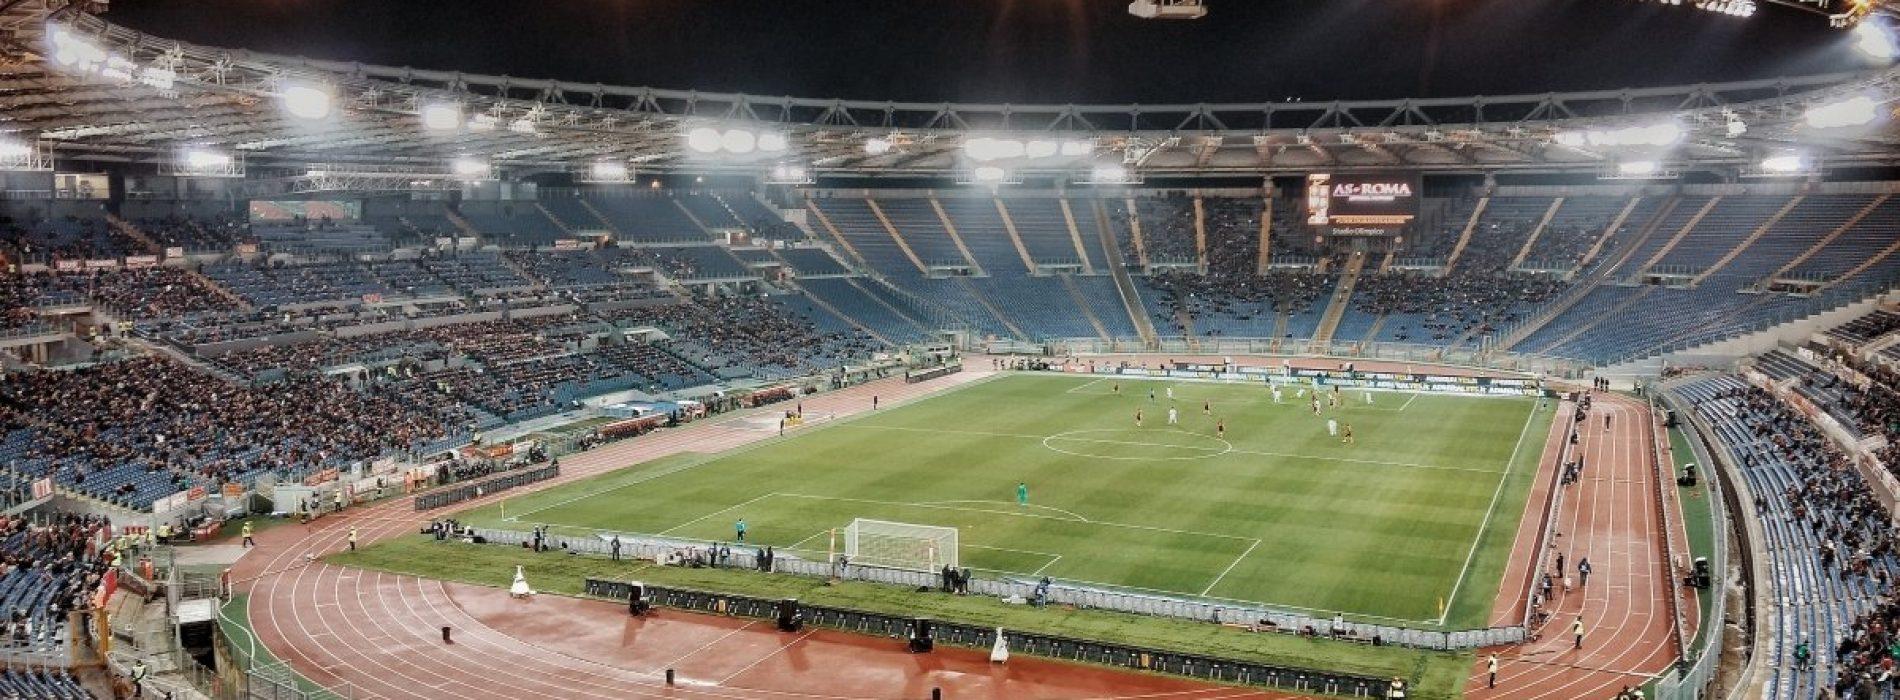 Serie A sintesi prima giornata: vittorie per Juve, Napoli e Milan